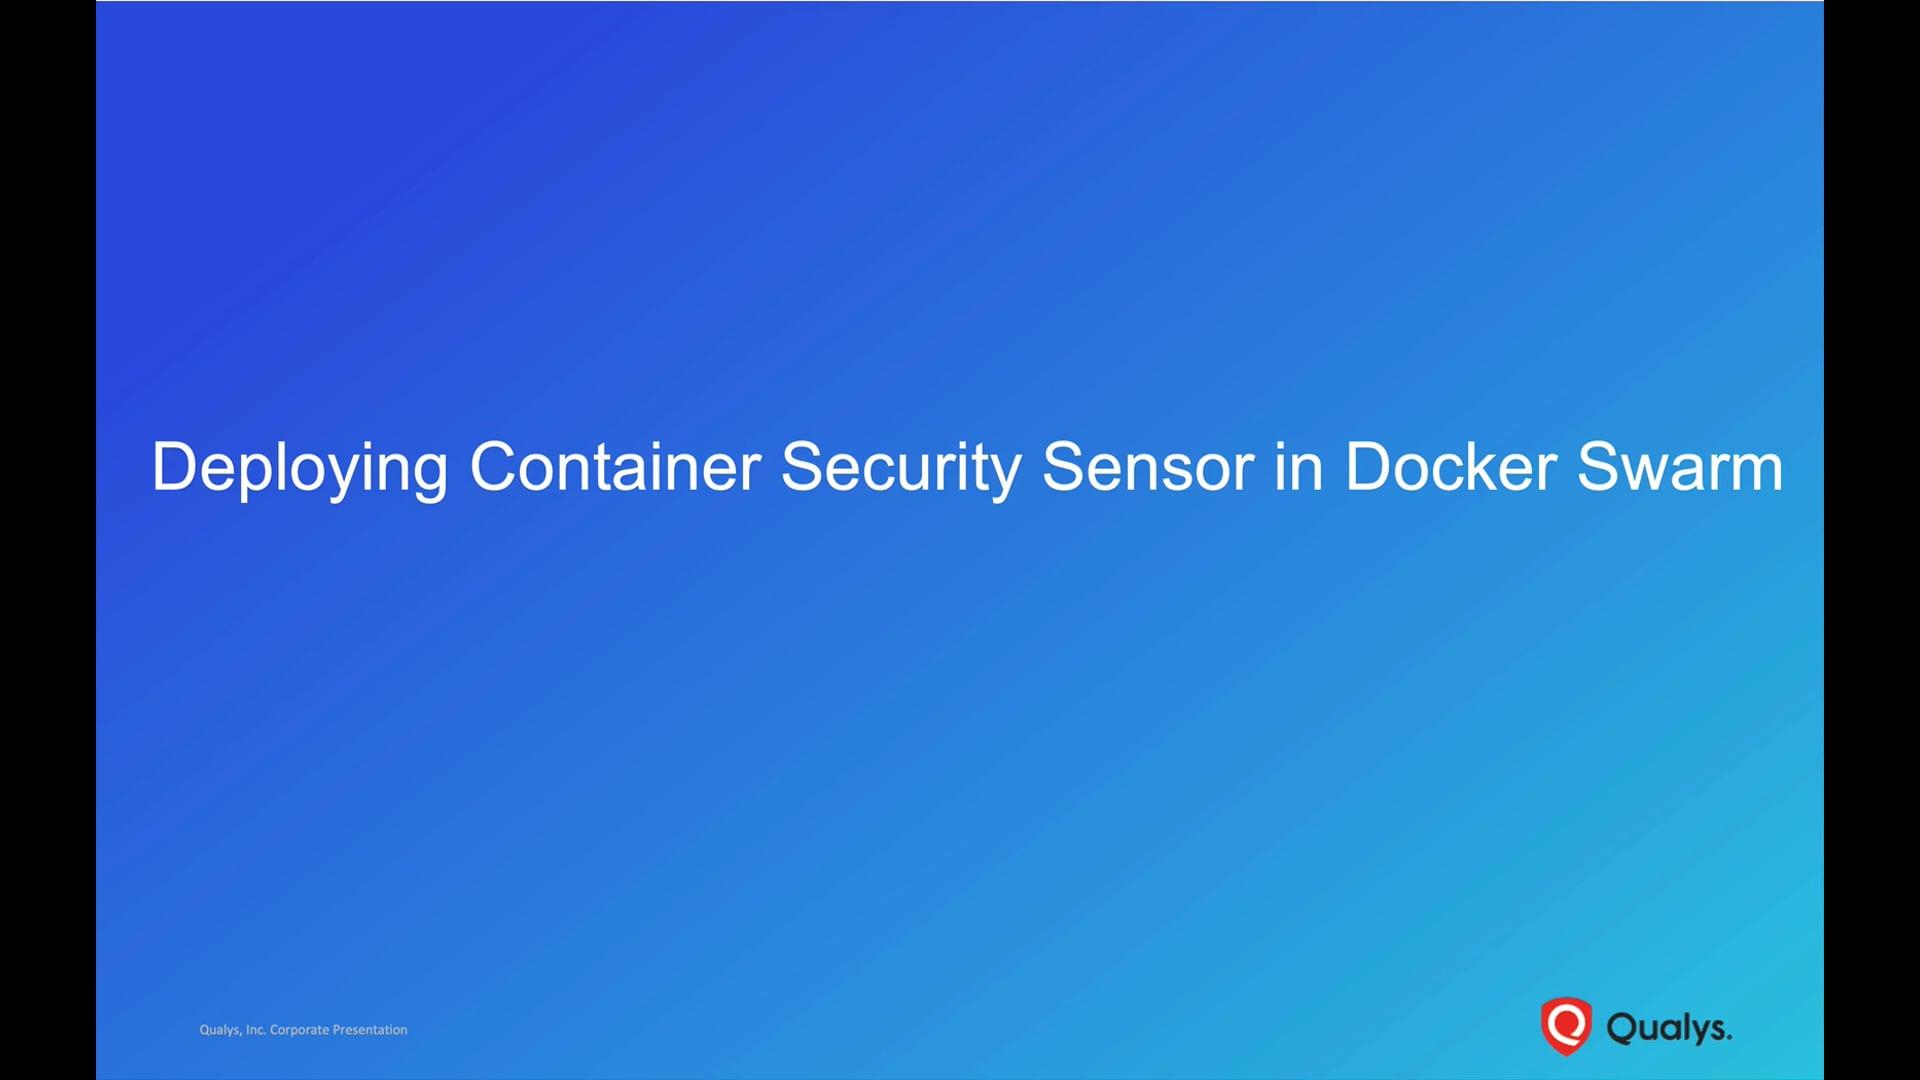 Deploying Container Security Sensor in Docker Swarm